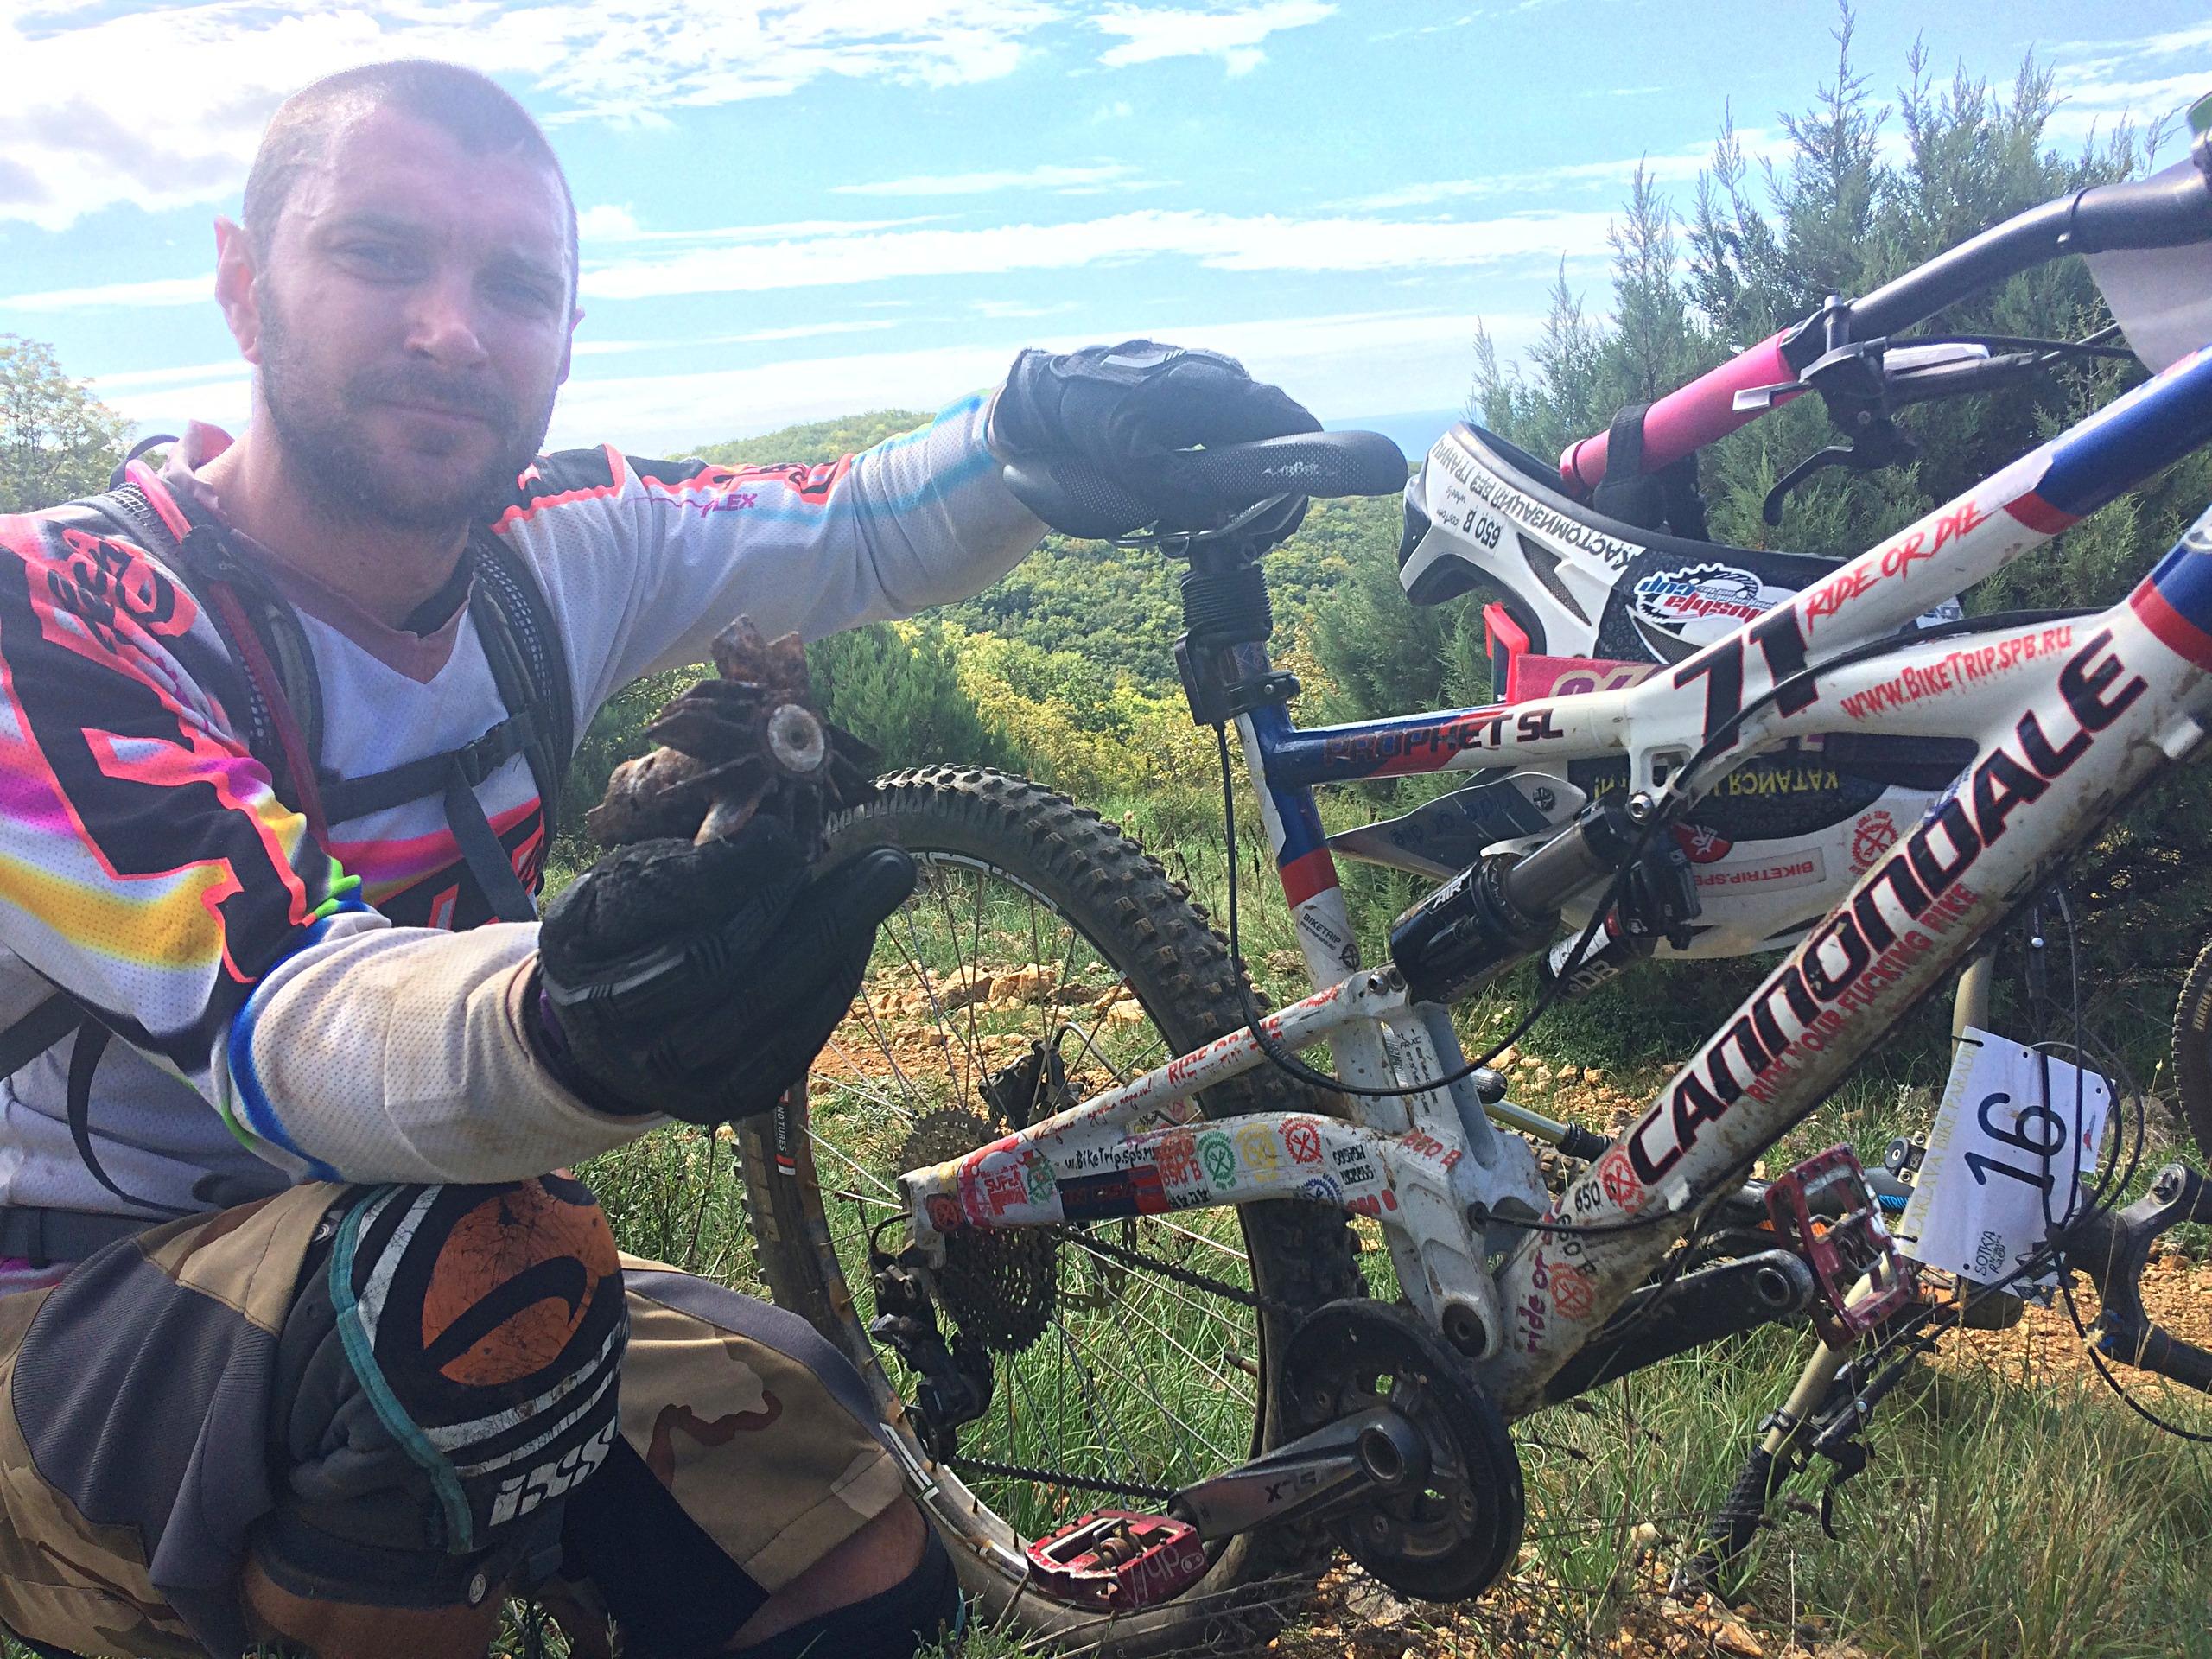 Блог компании Триал-Спорт: GT: Пленник Эндуро